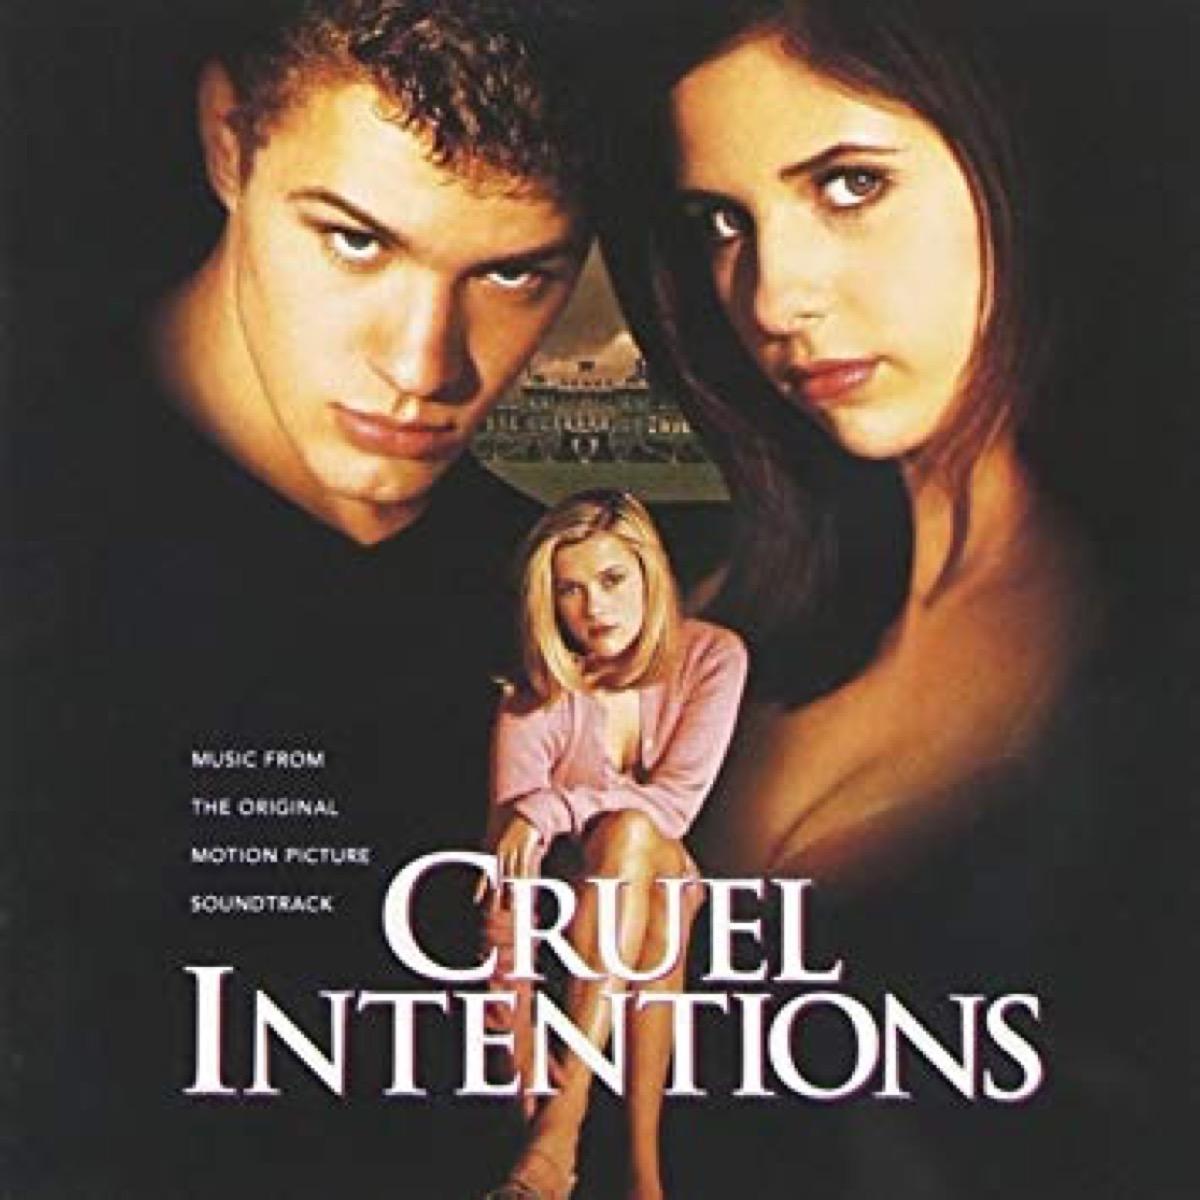 cruel intentions movie soundtrack cover